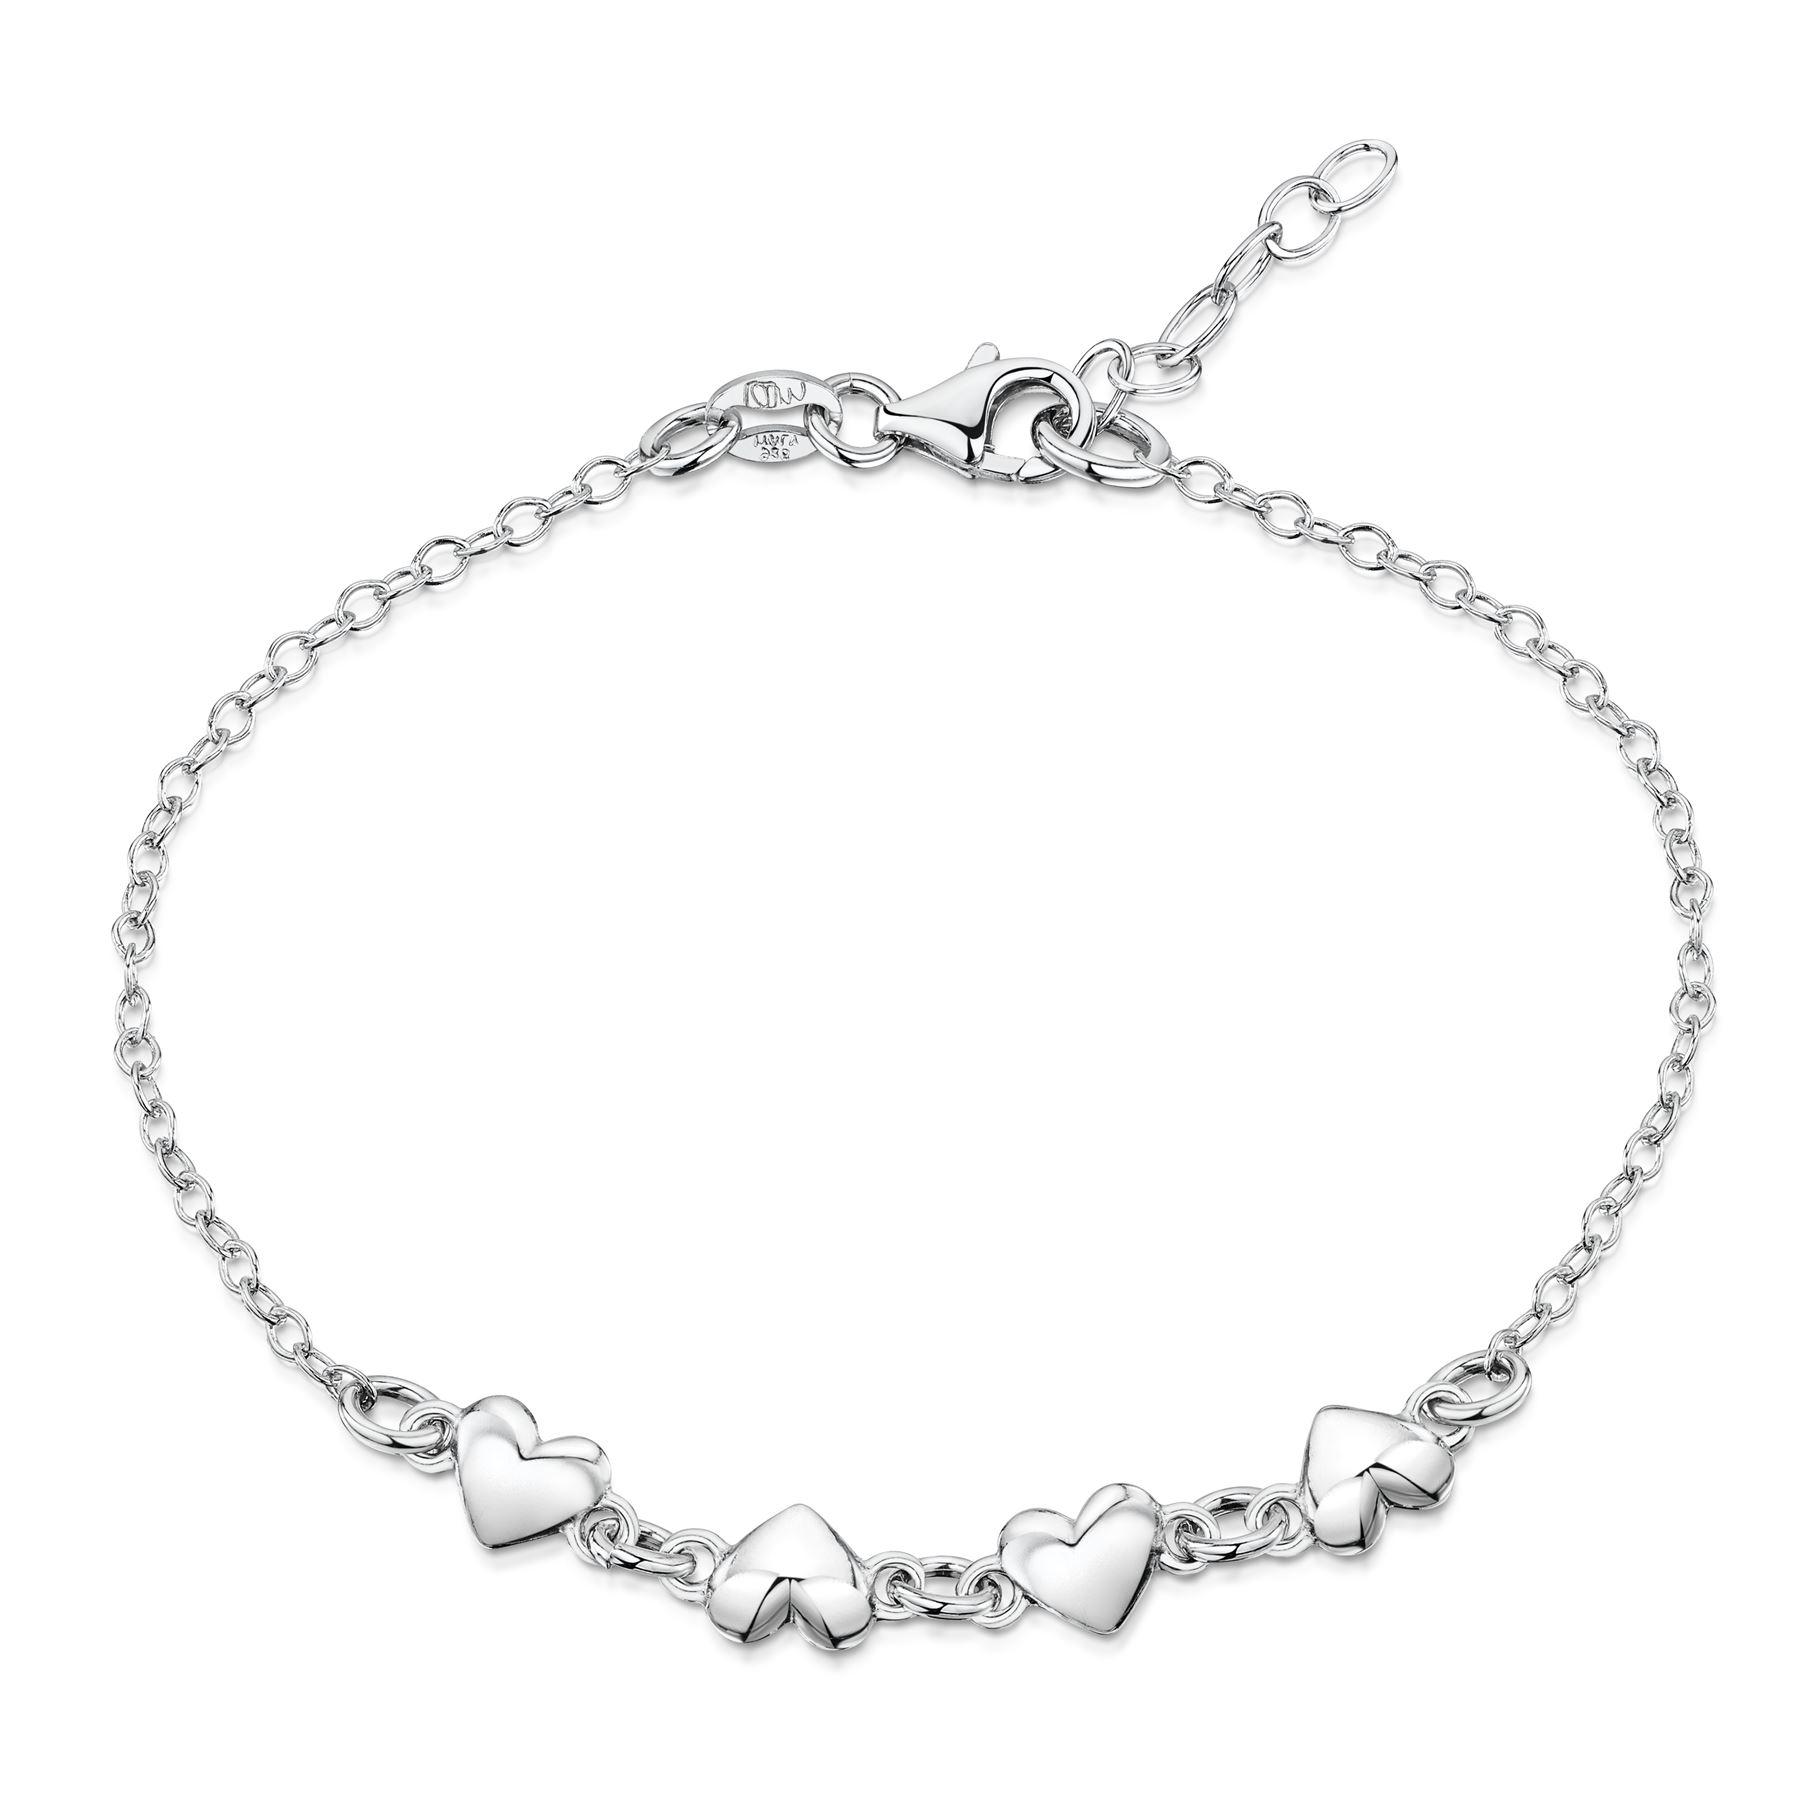 Amberta-Jewelry-925-Sterling-Silver-Adjustable-Bracelet-Italian-Bangle-for-Women thumbnail 59